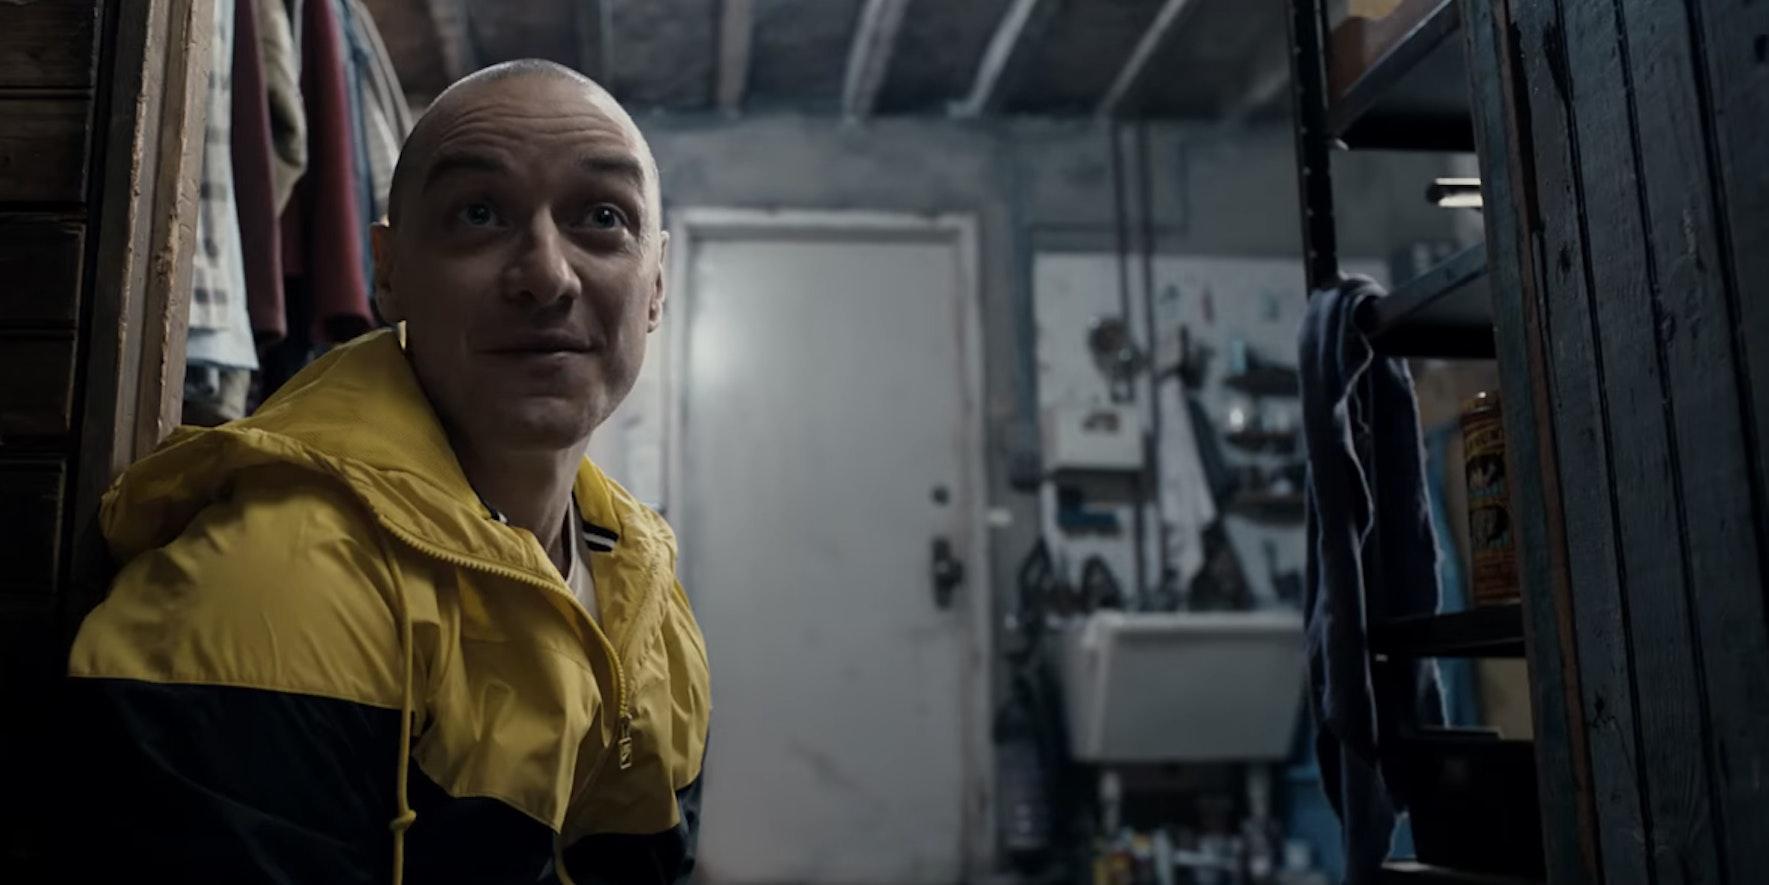 What M. Night Shyamalan's 'Split' Trailer Weirdly Gets Right